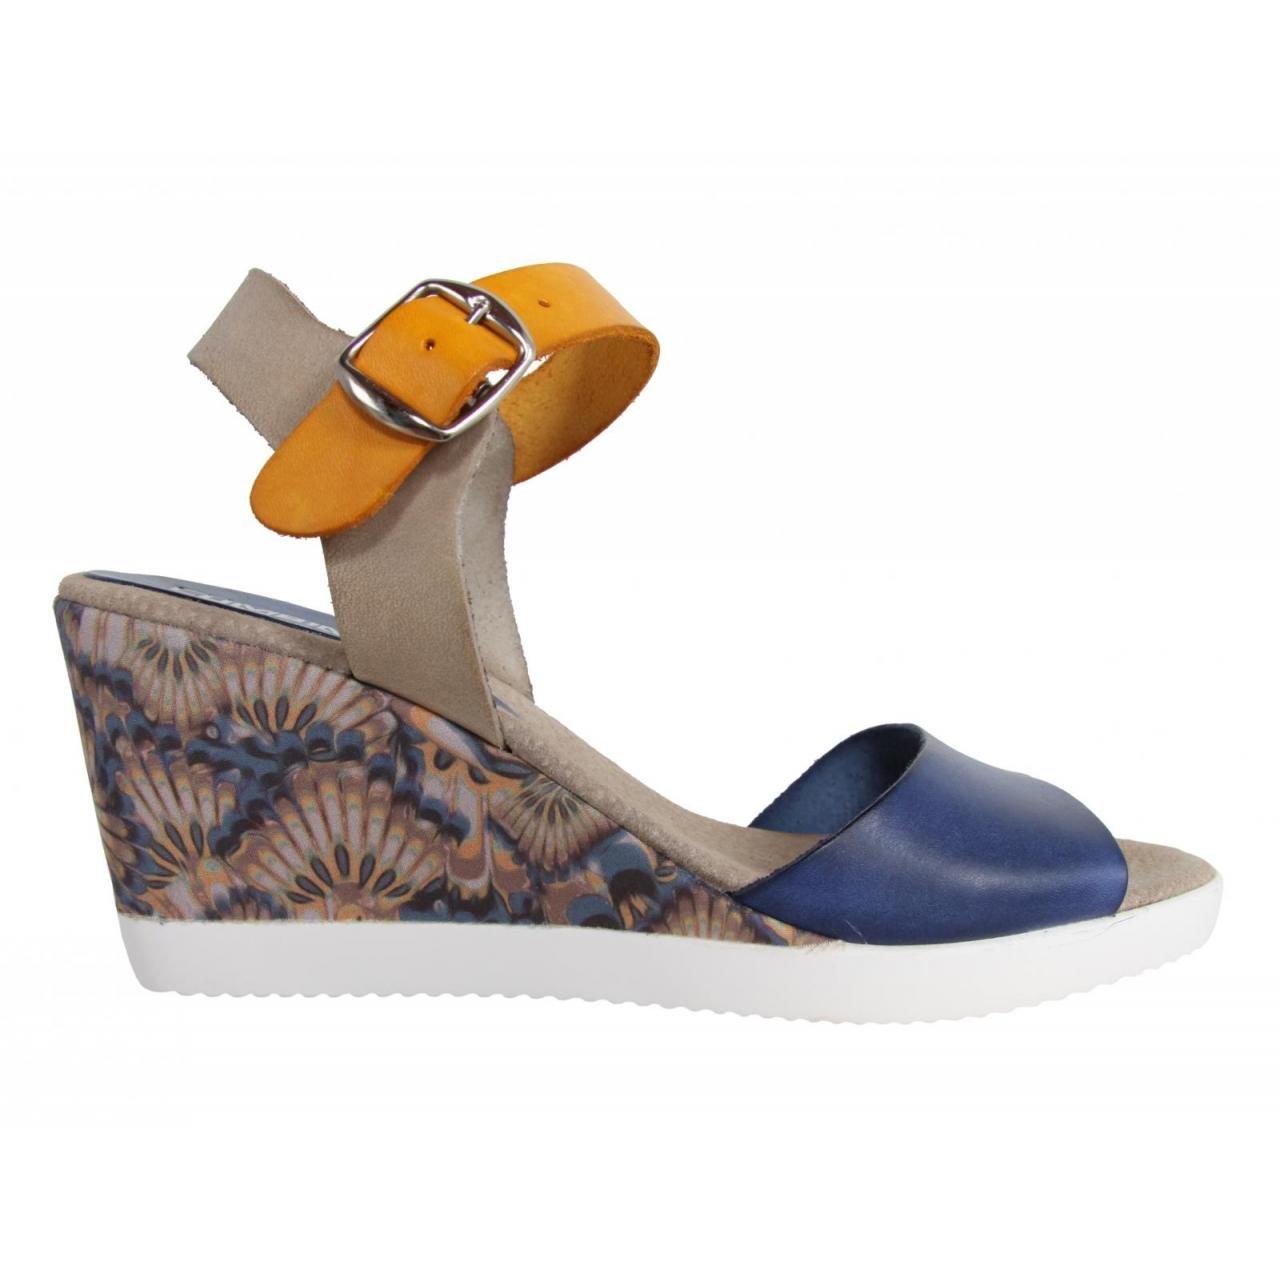 CUMBIA Schuhe Keilabsatz für Damen 30151 Jeans